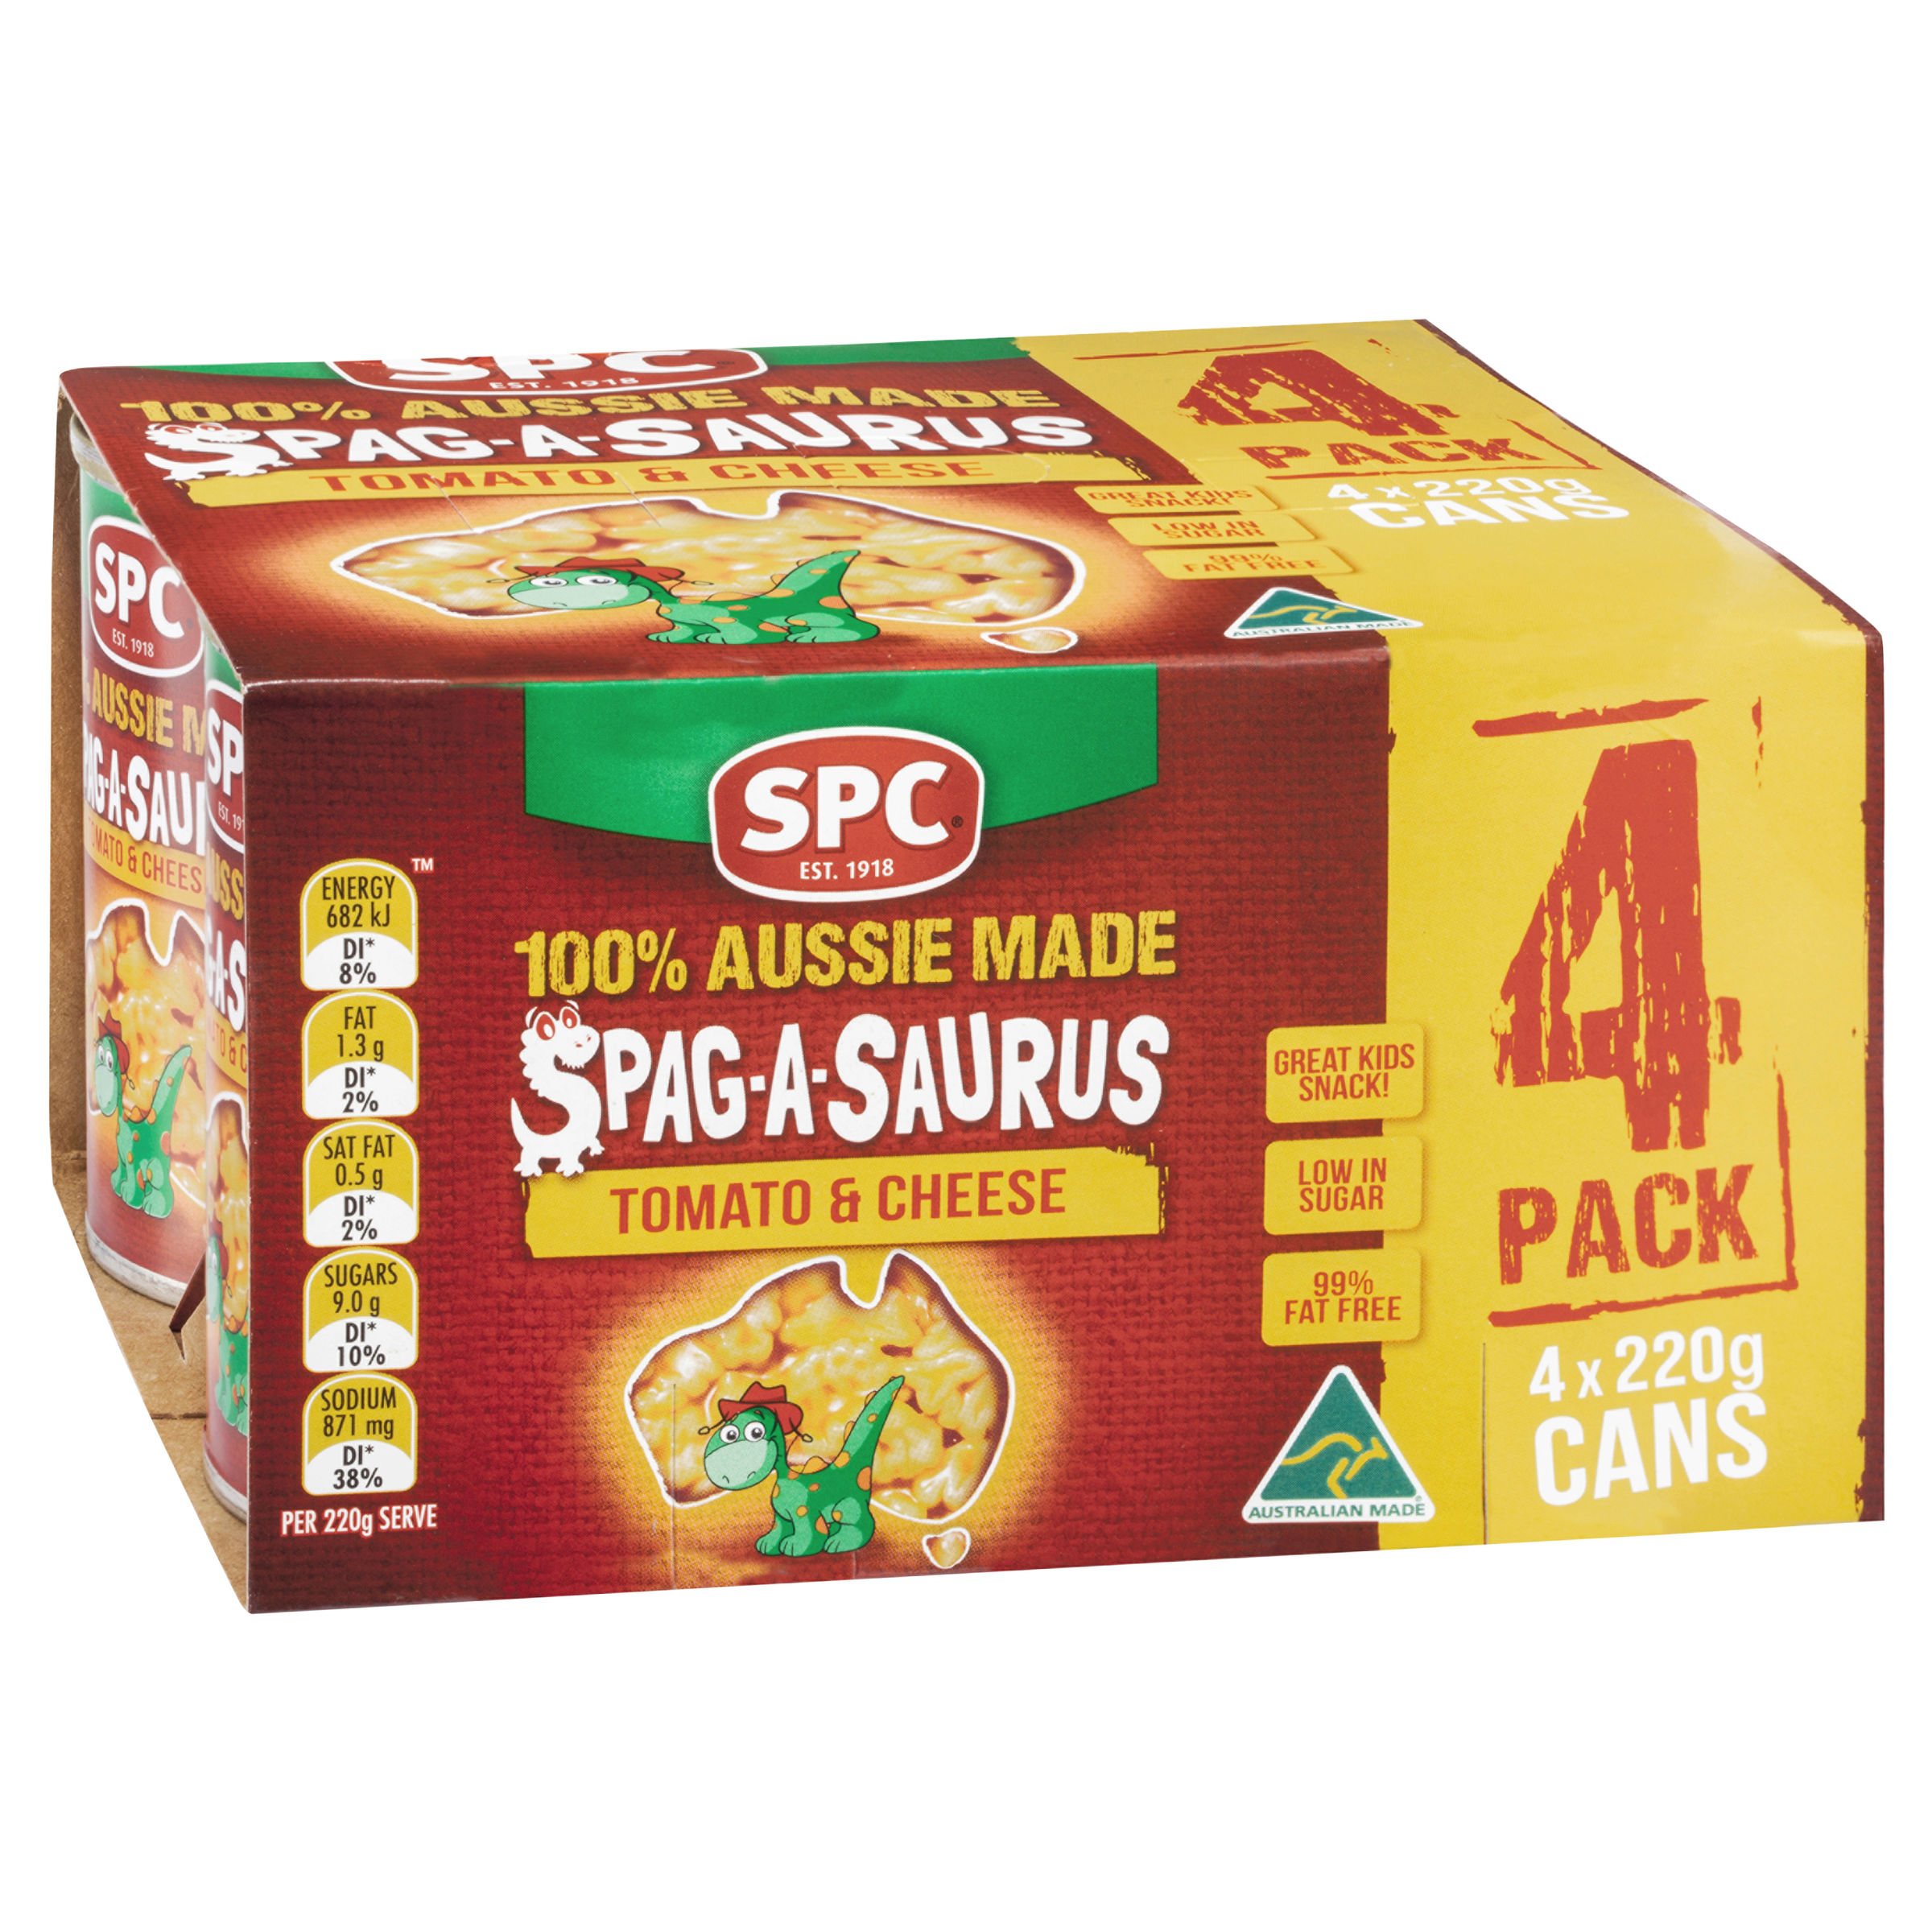 SPC Spag-A-Saurus Tomato & Cheese 4 x 220g